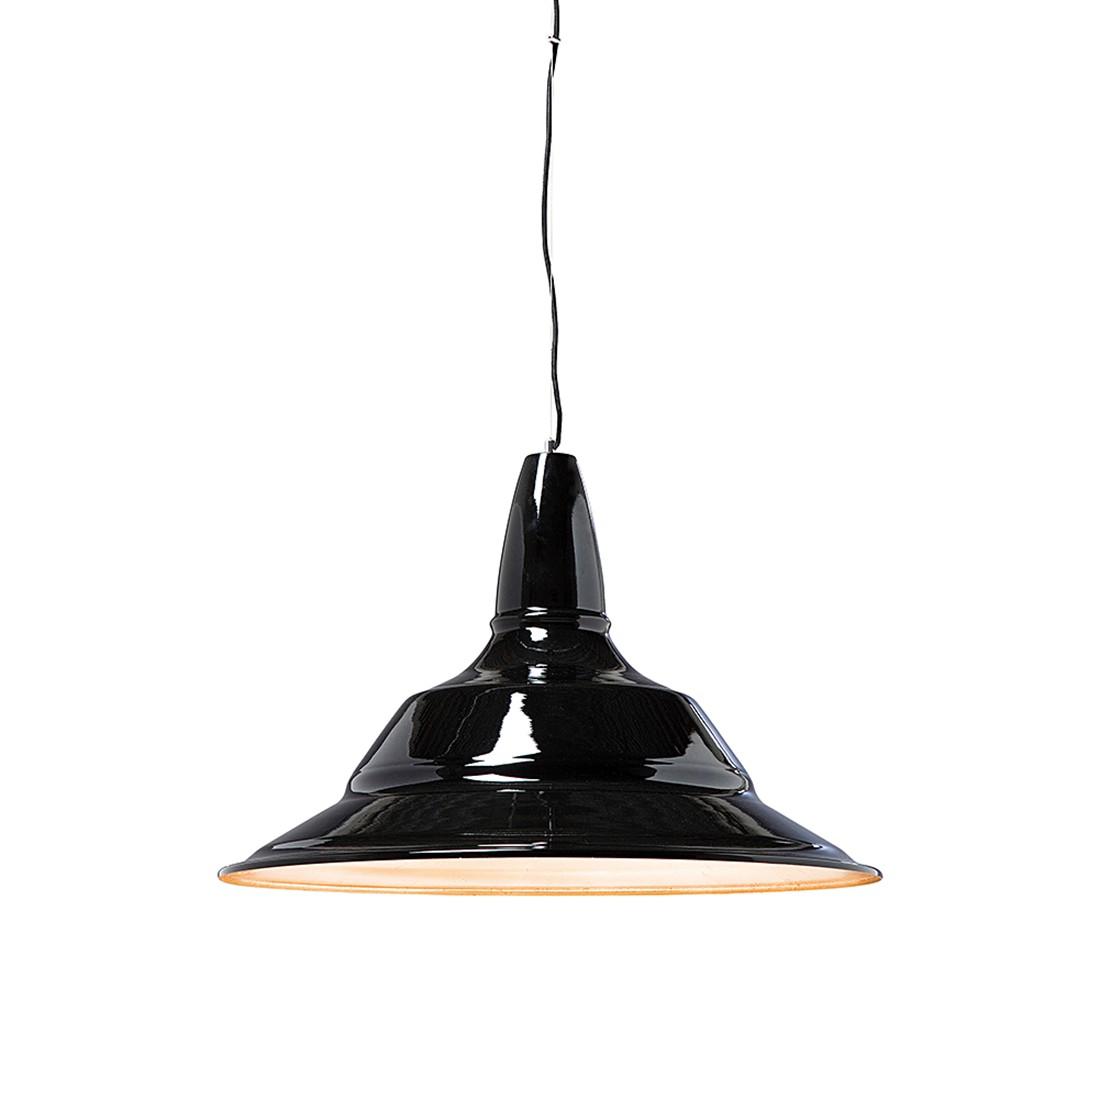 h ngeleuchte plate aluminium schwarz kare design a. Black Bedroom Furniture Sets. Home Design Ideas